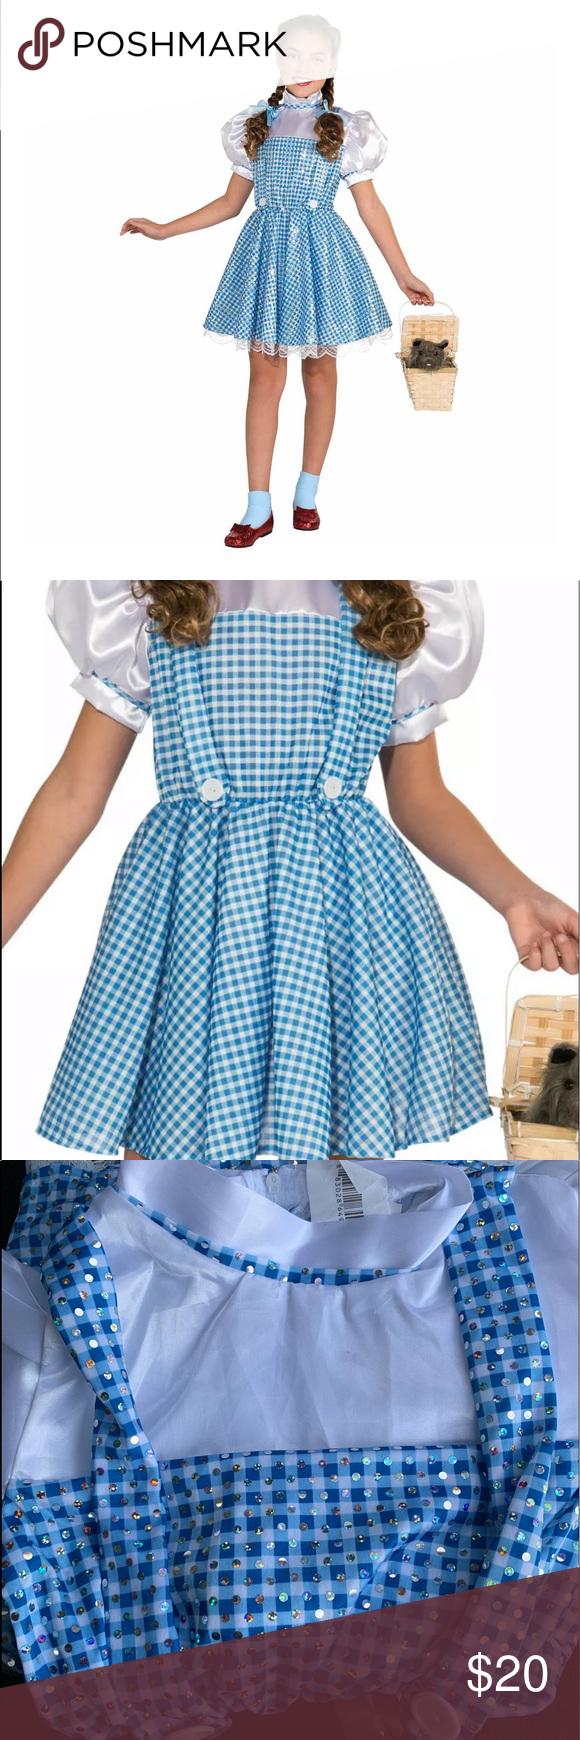 The Wizard Of Oz Dorothy Child Costume Small 4 6 Clothes Design Fashion Fashion Design